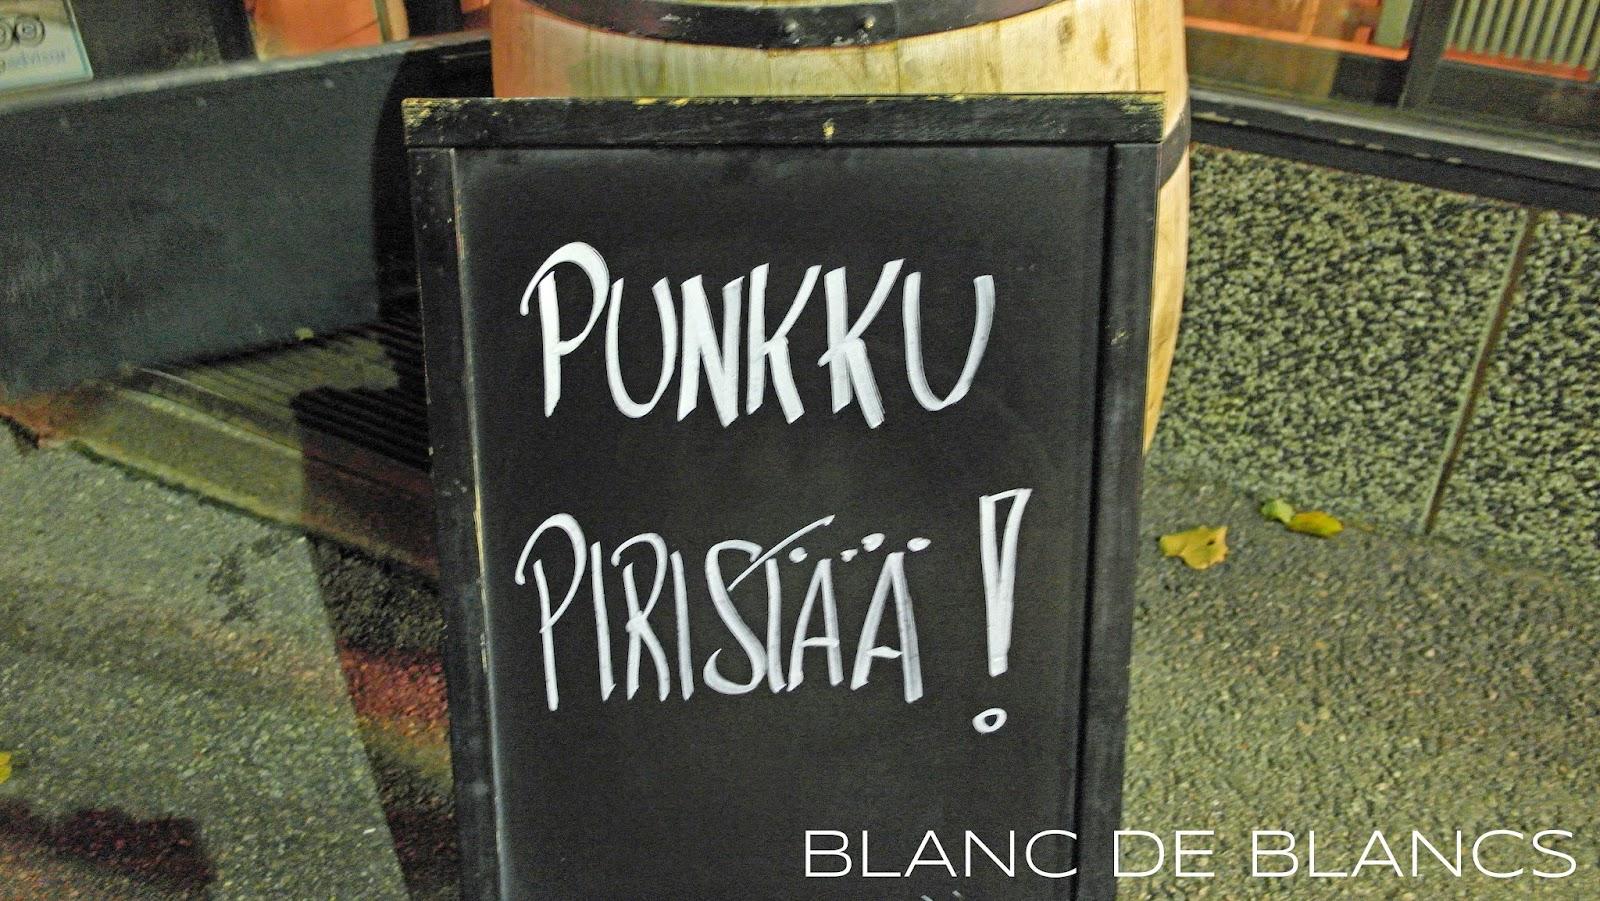 Punkku piristää! - www.blancdeblancs.fi